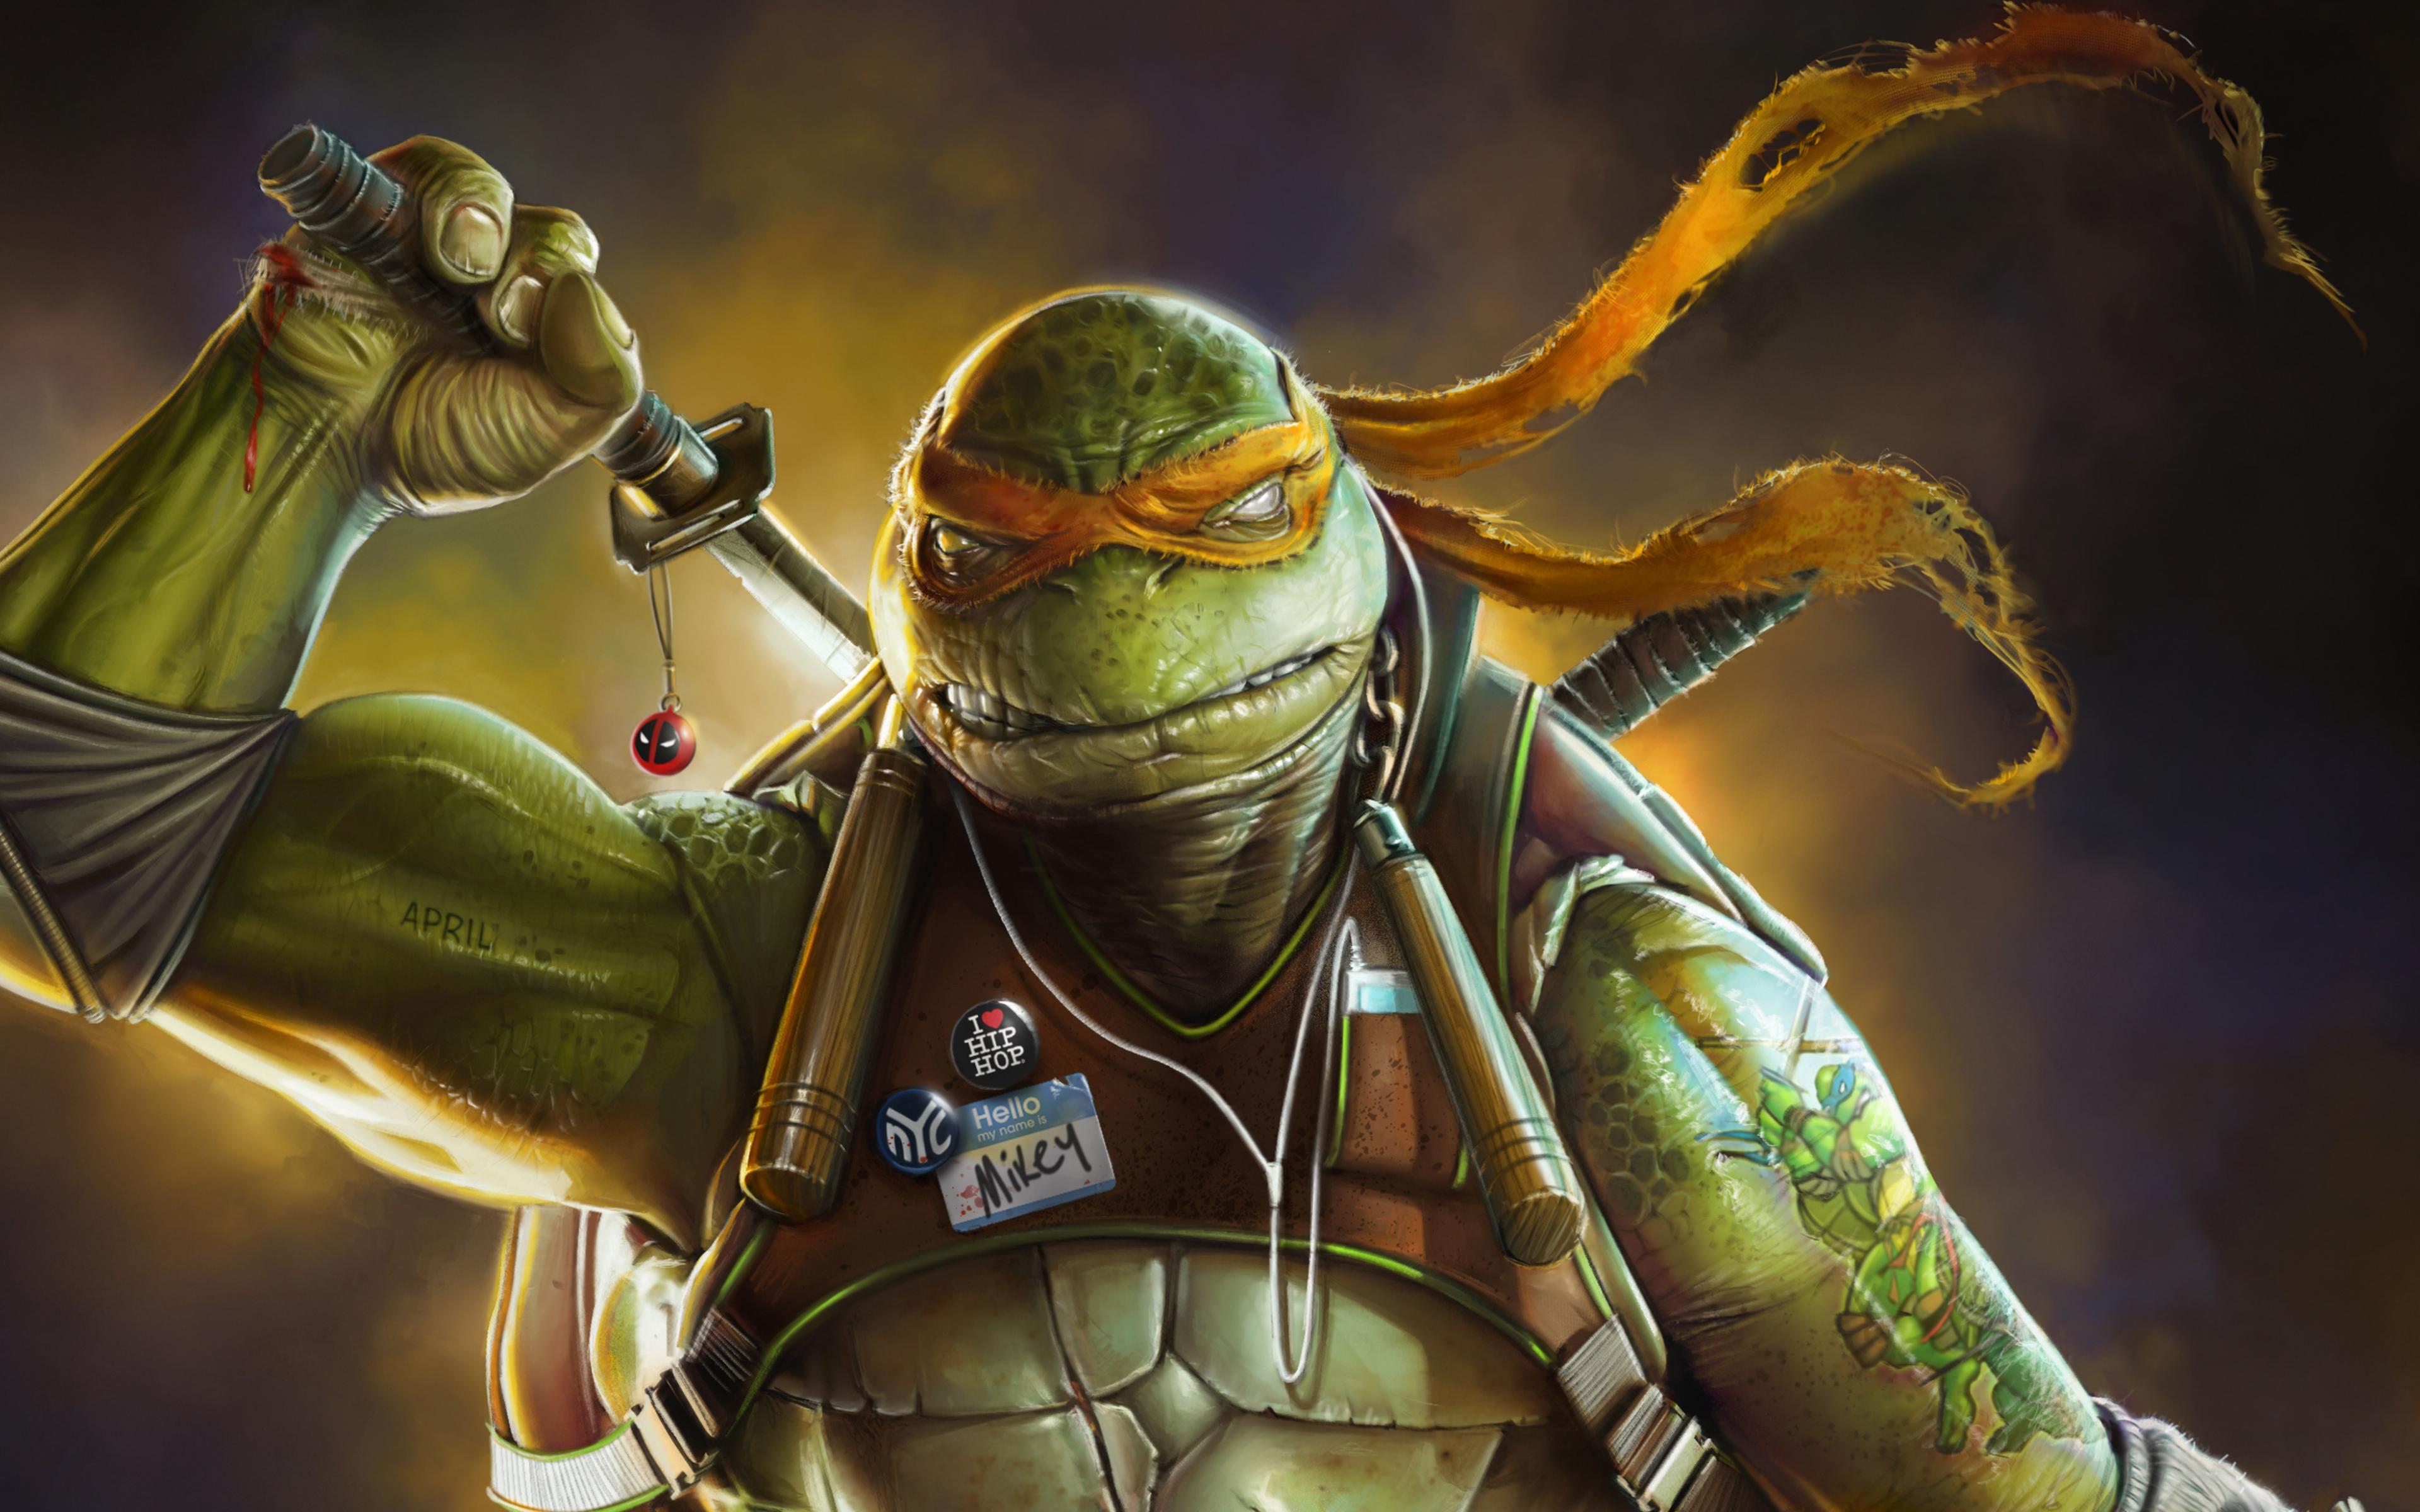 Download 3840x2400 Wallpaper Teenage Mutant Ninja Turtles Turtles